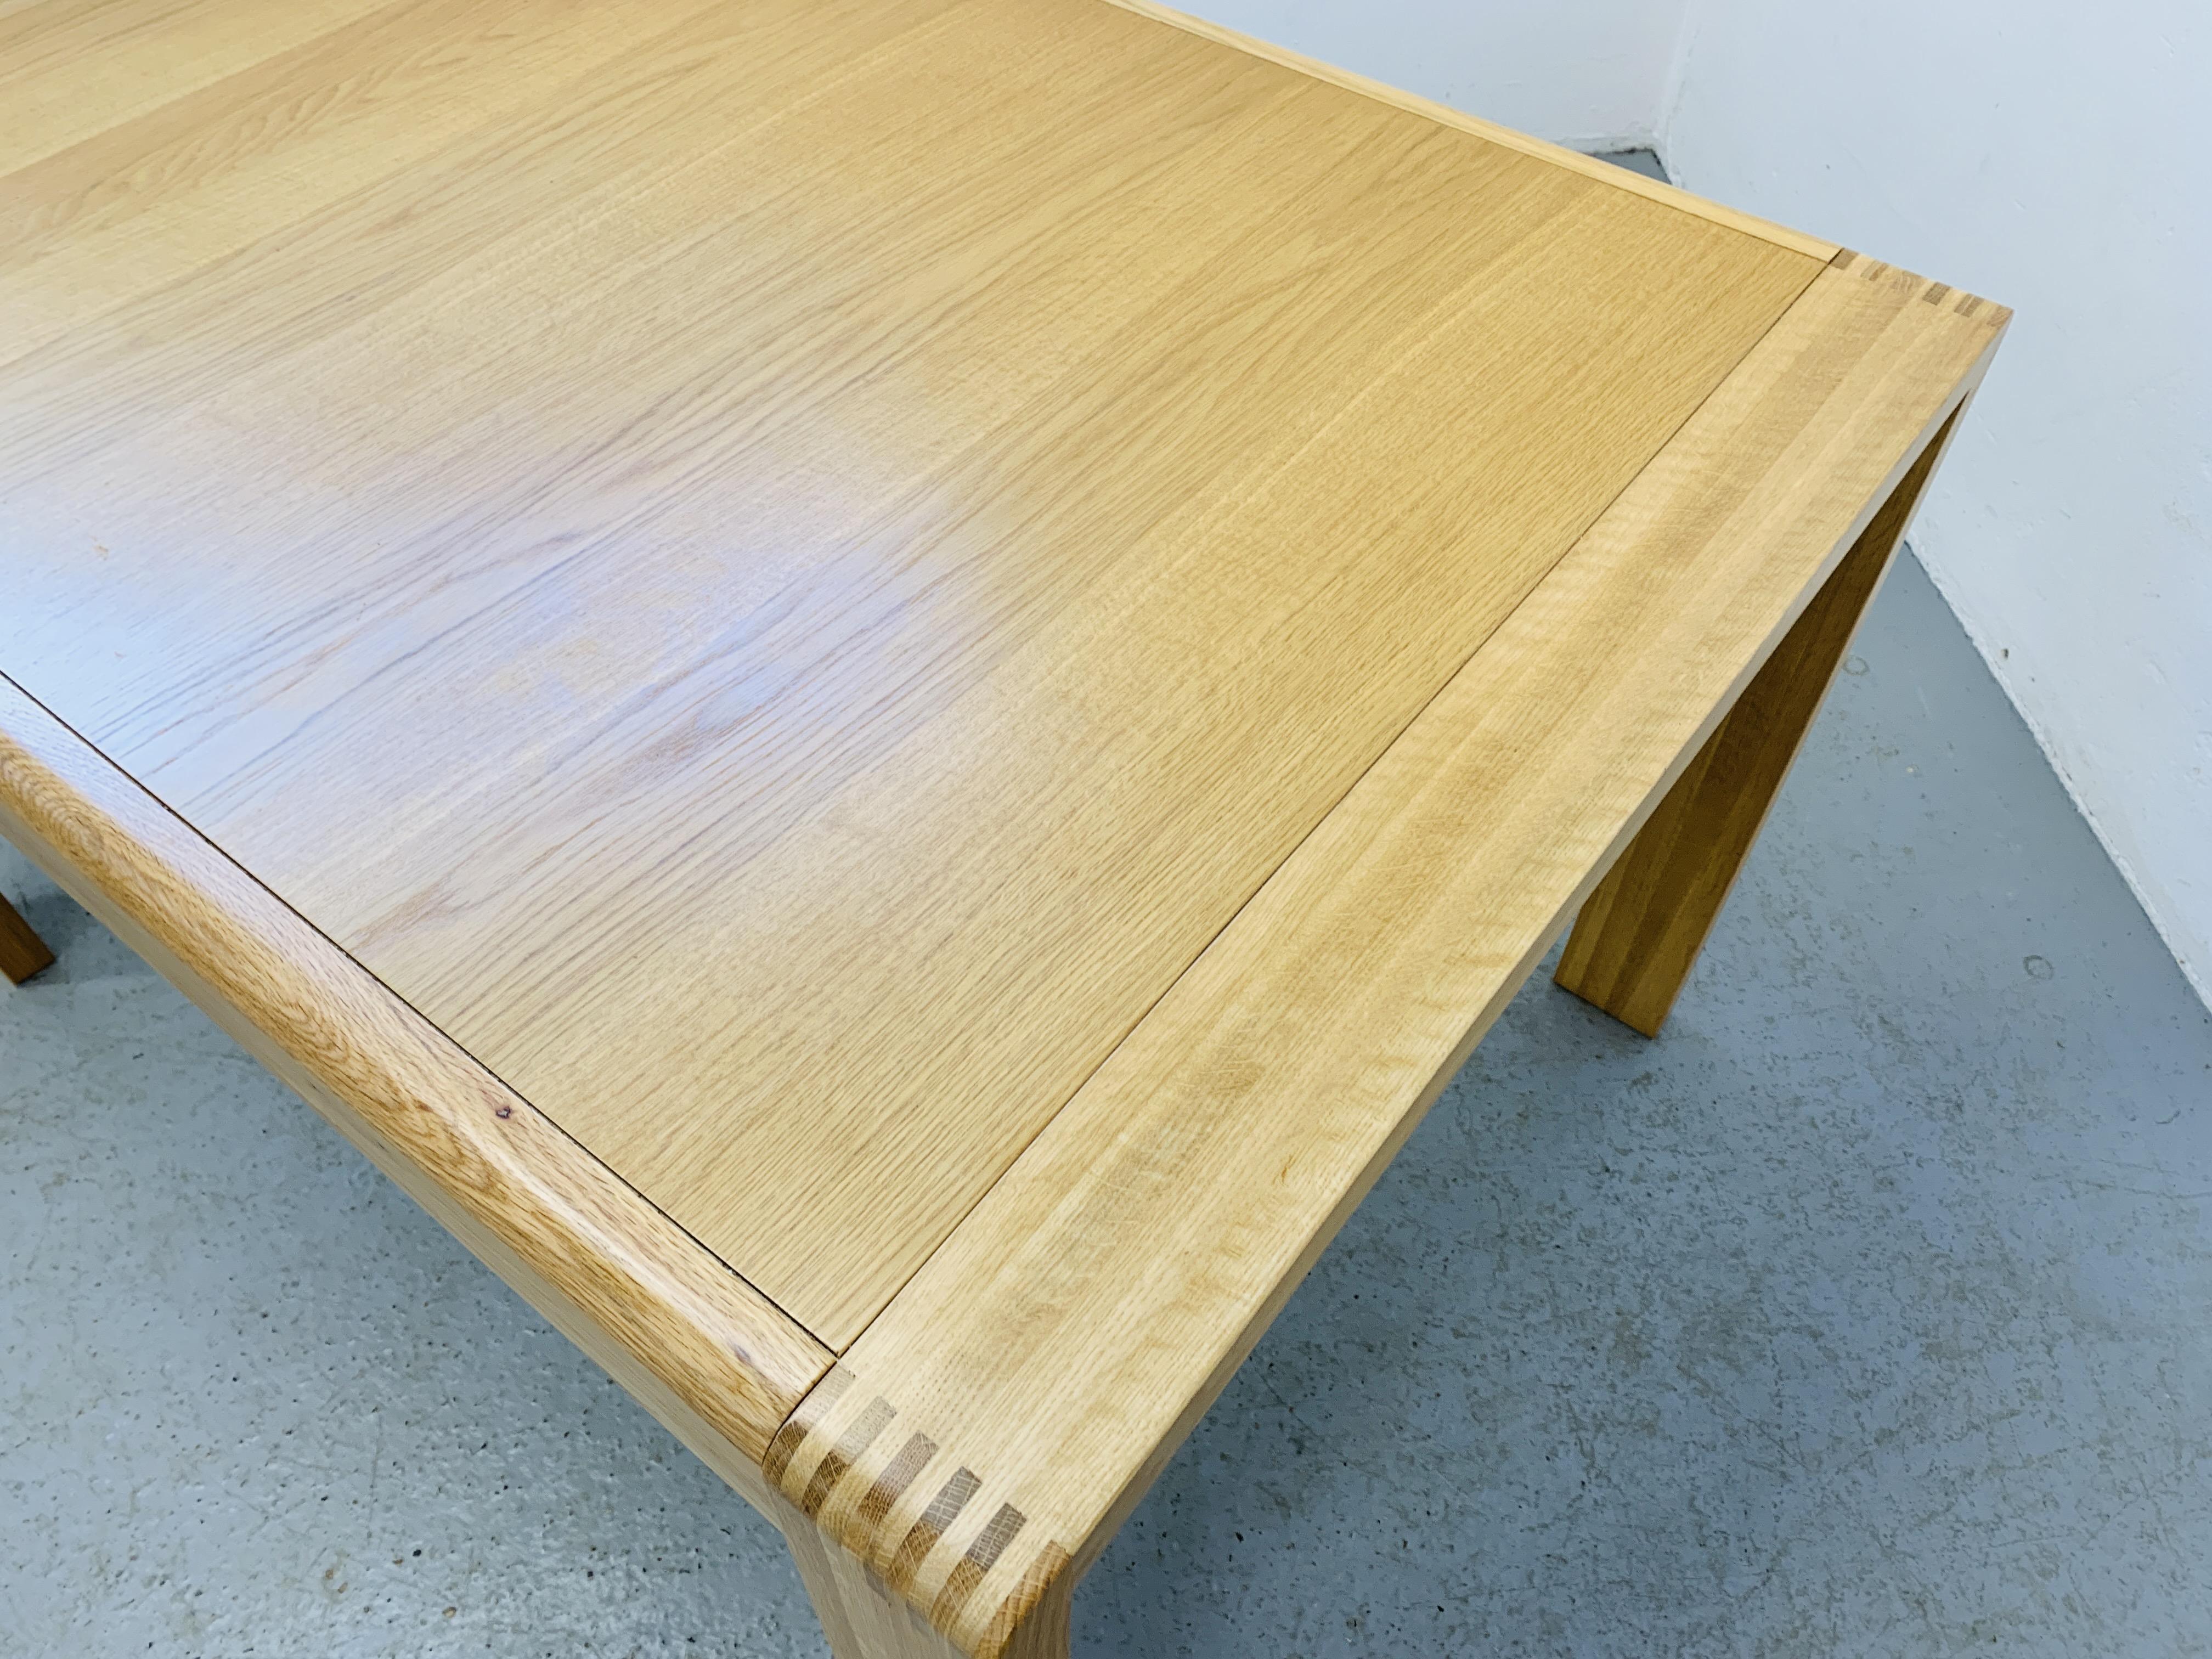 "AN ERCOL ""BOSCO"" OAK DESIGNER DINING TABLE 130CM X 90CM - Image 6 of 14"